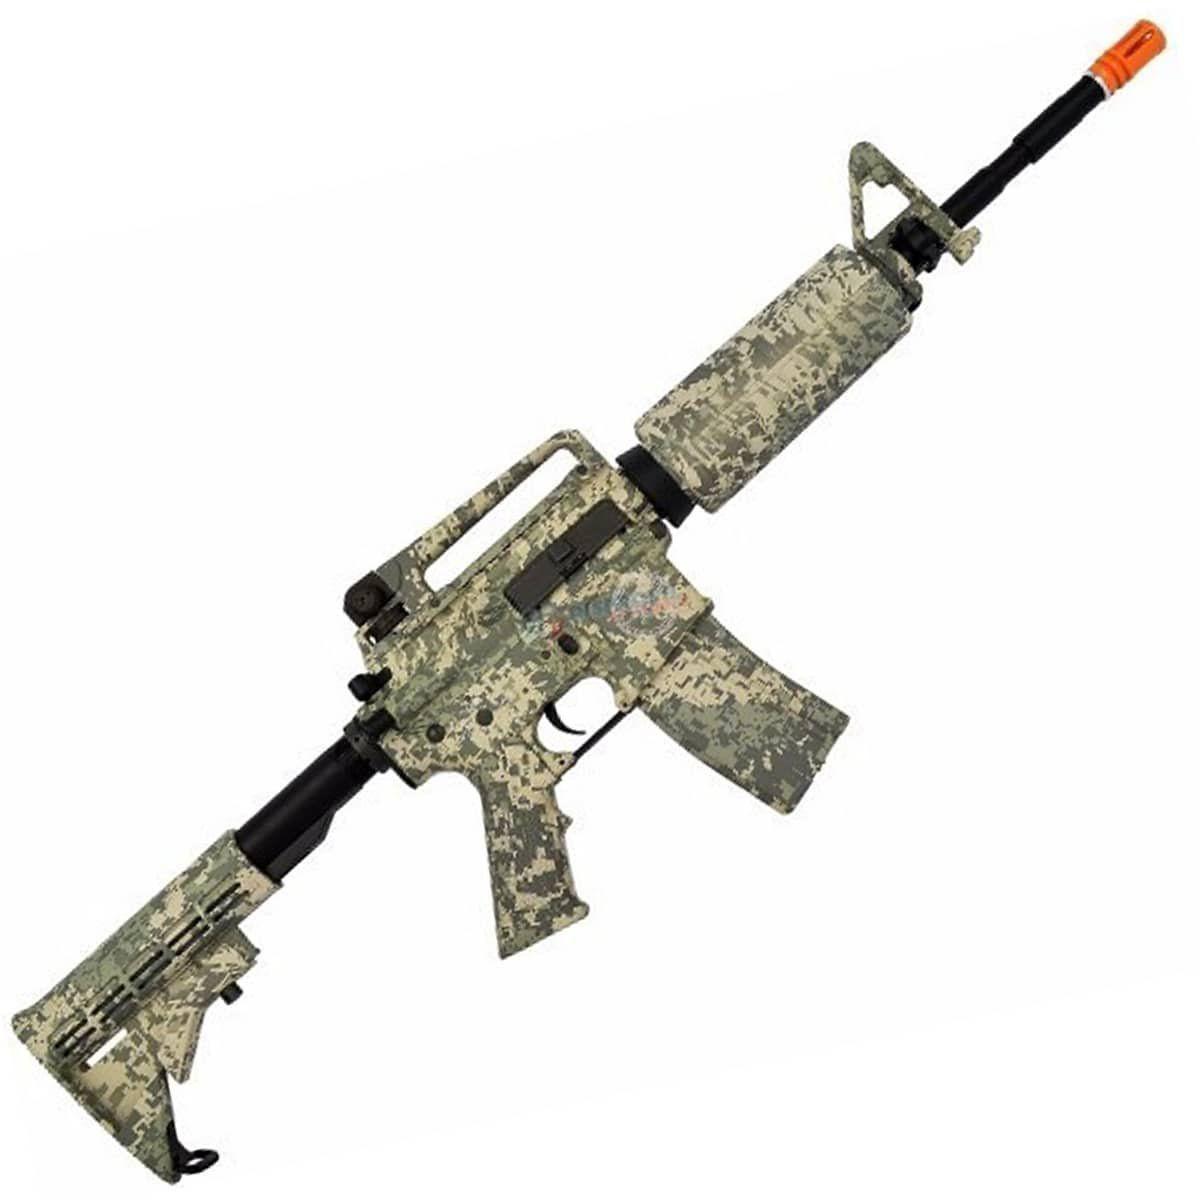 Rifle De Airsoft Elétrico King Arms M4 Navy Seals Desert